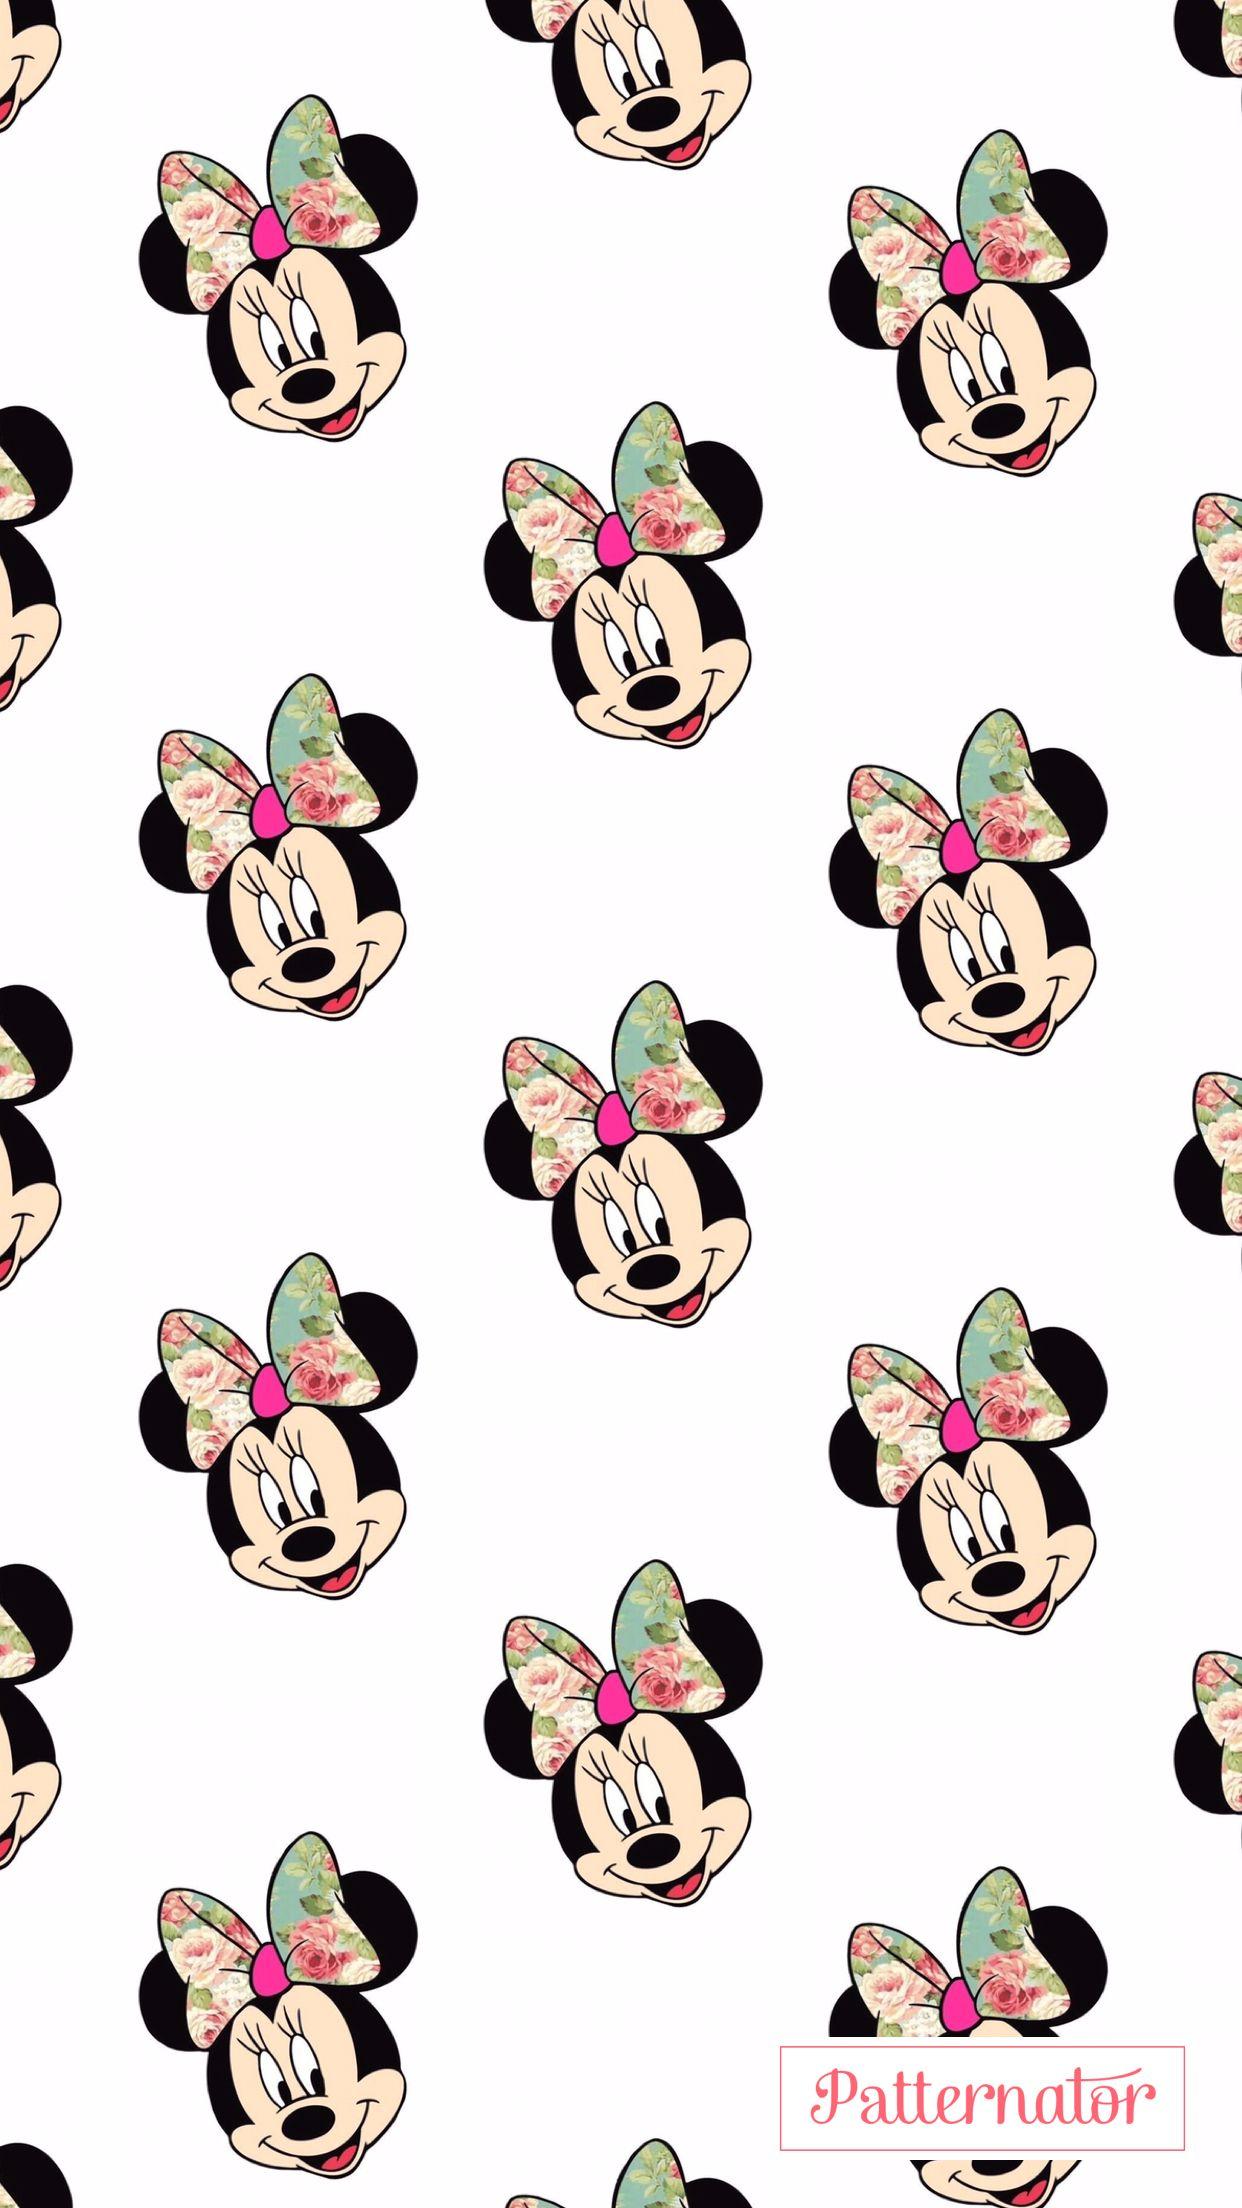 Wallpaper iphone mickey - Bueno Disney Mickeyminnie Mousewallpaper Iphone